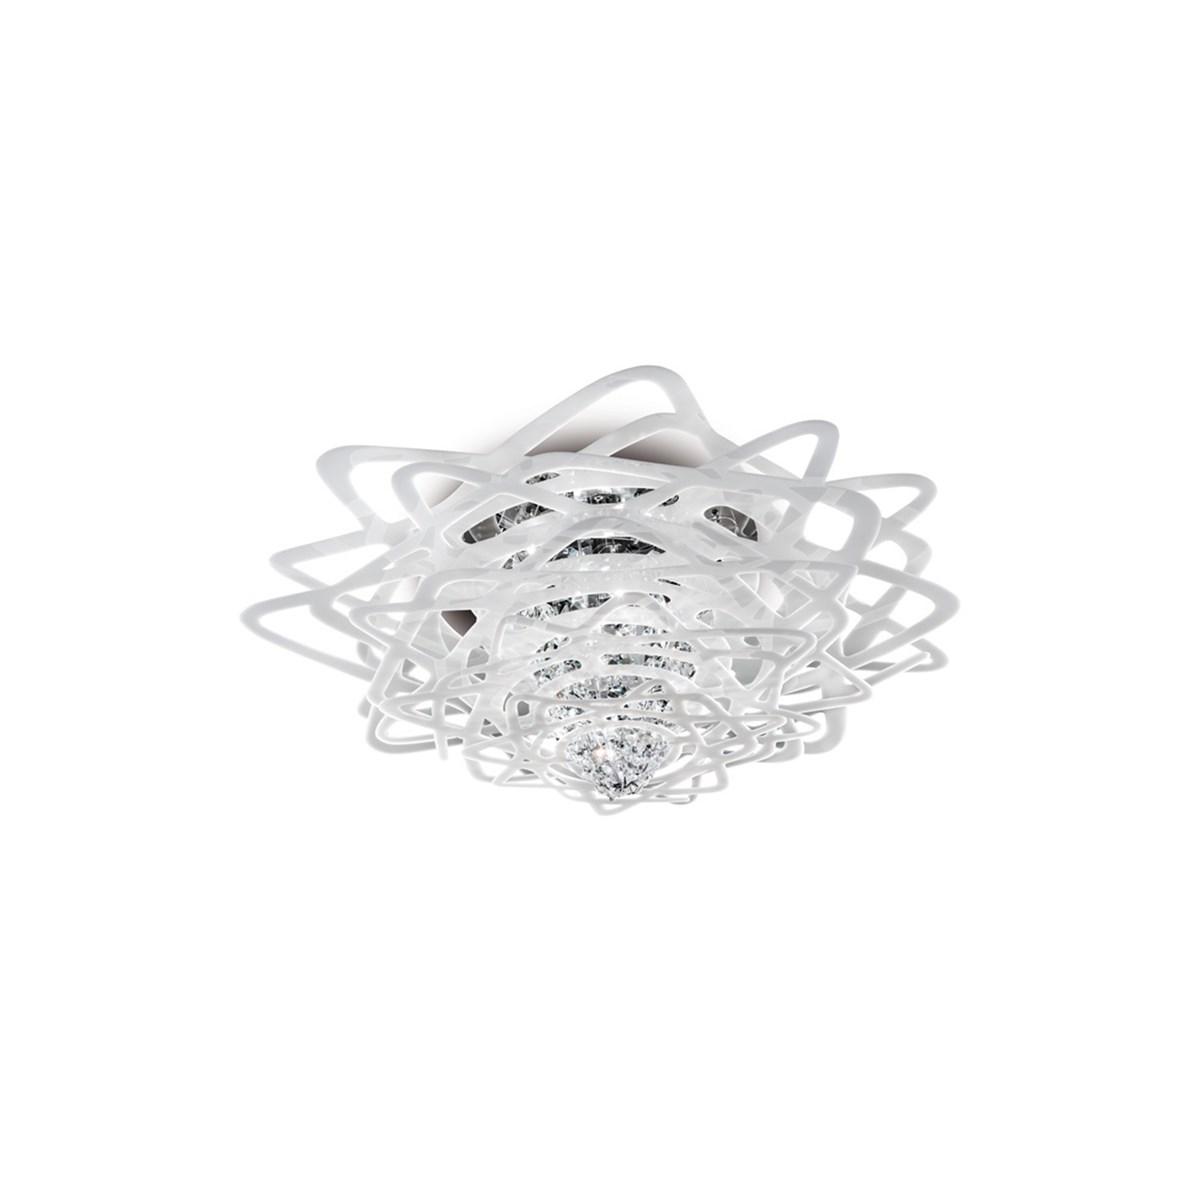 Slamp-Nigel-Coates-Aurora-Ceiling-Light-Matisse-1